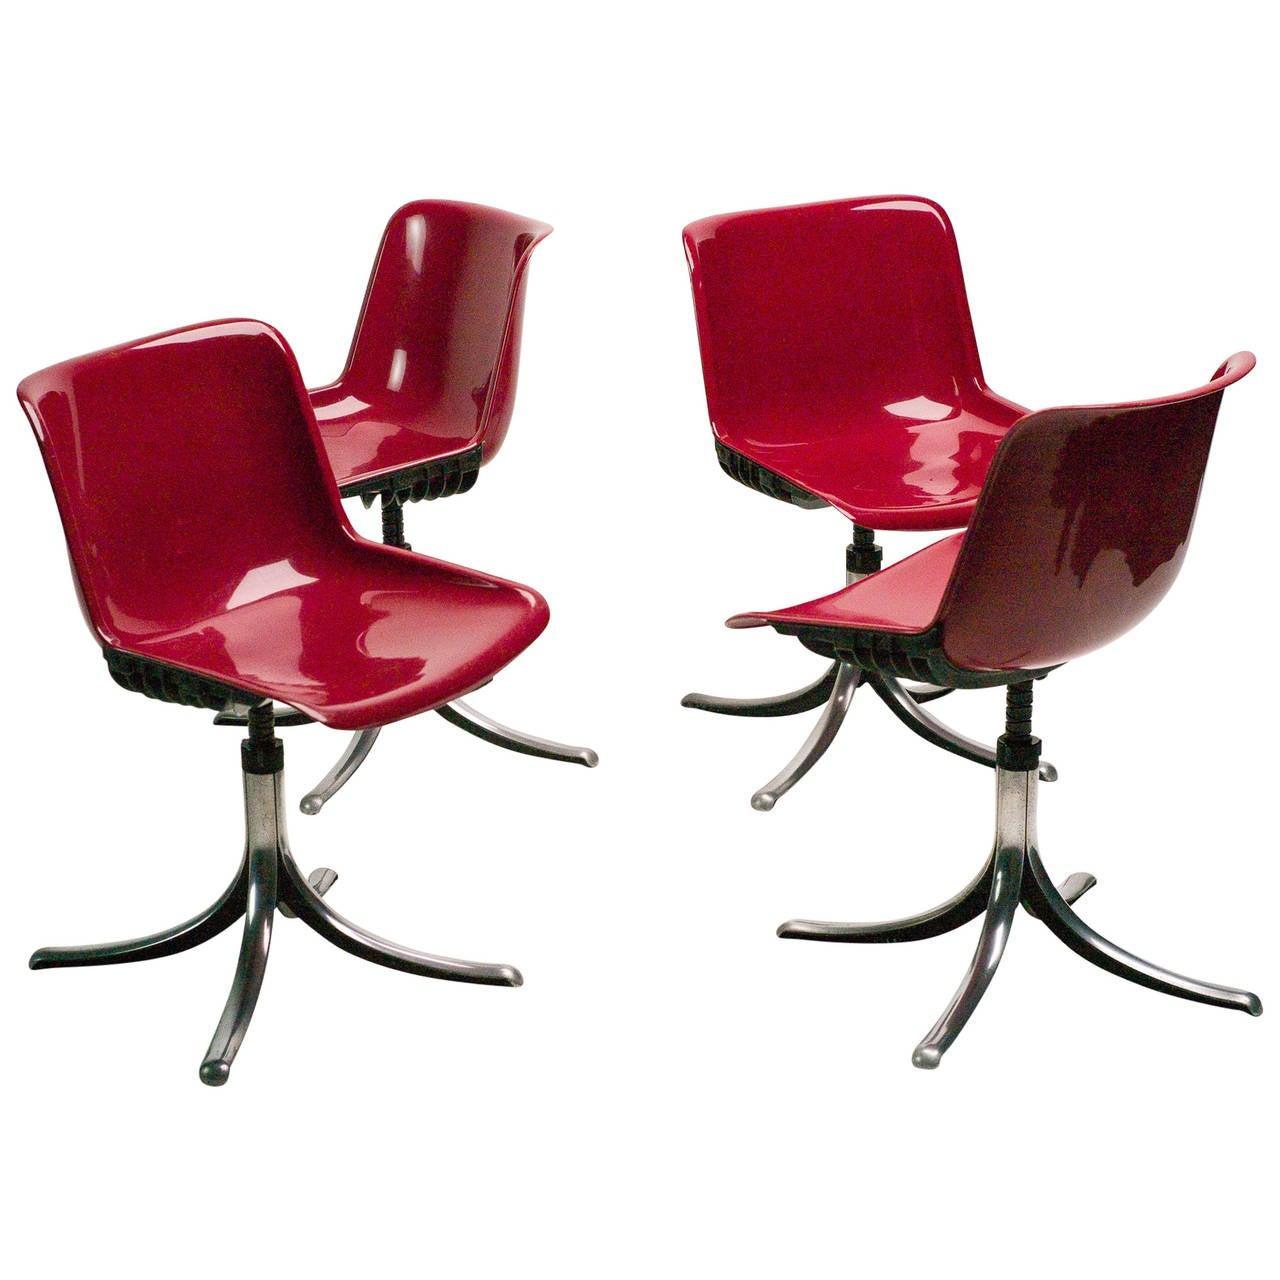 Set of Three Tecno Modus Chairs Designed by Osvaldo Borsani 1